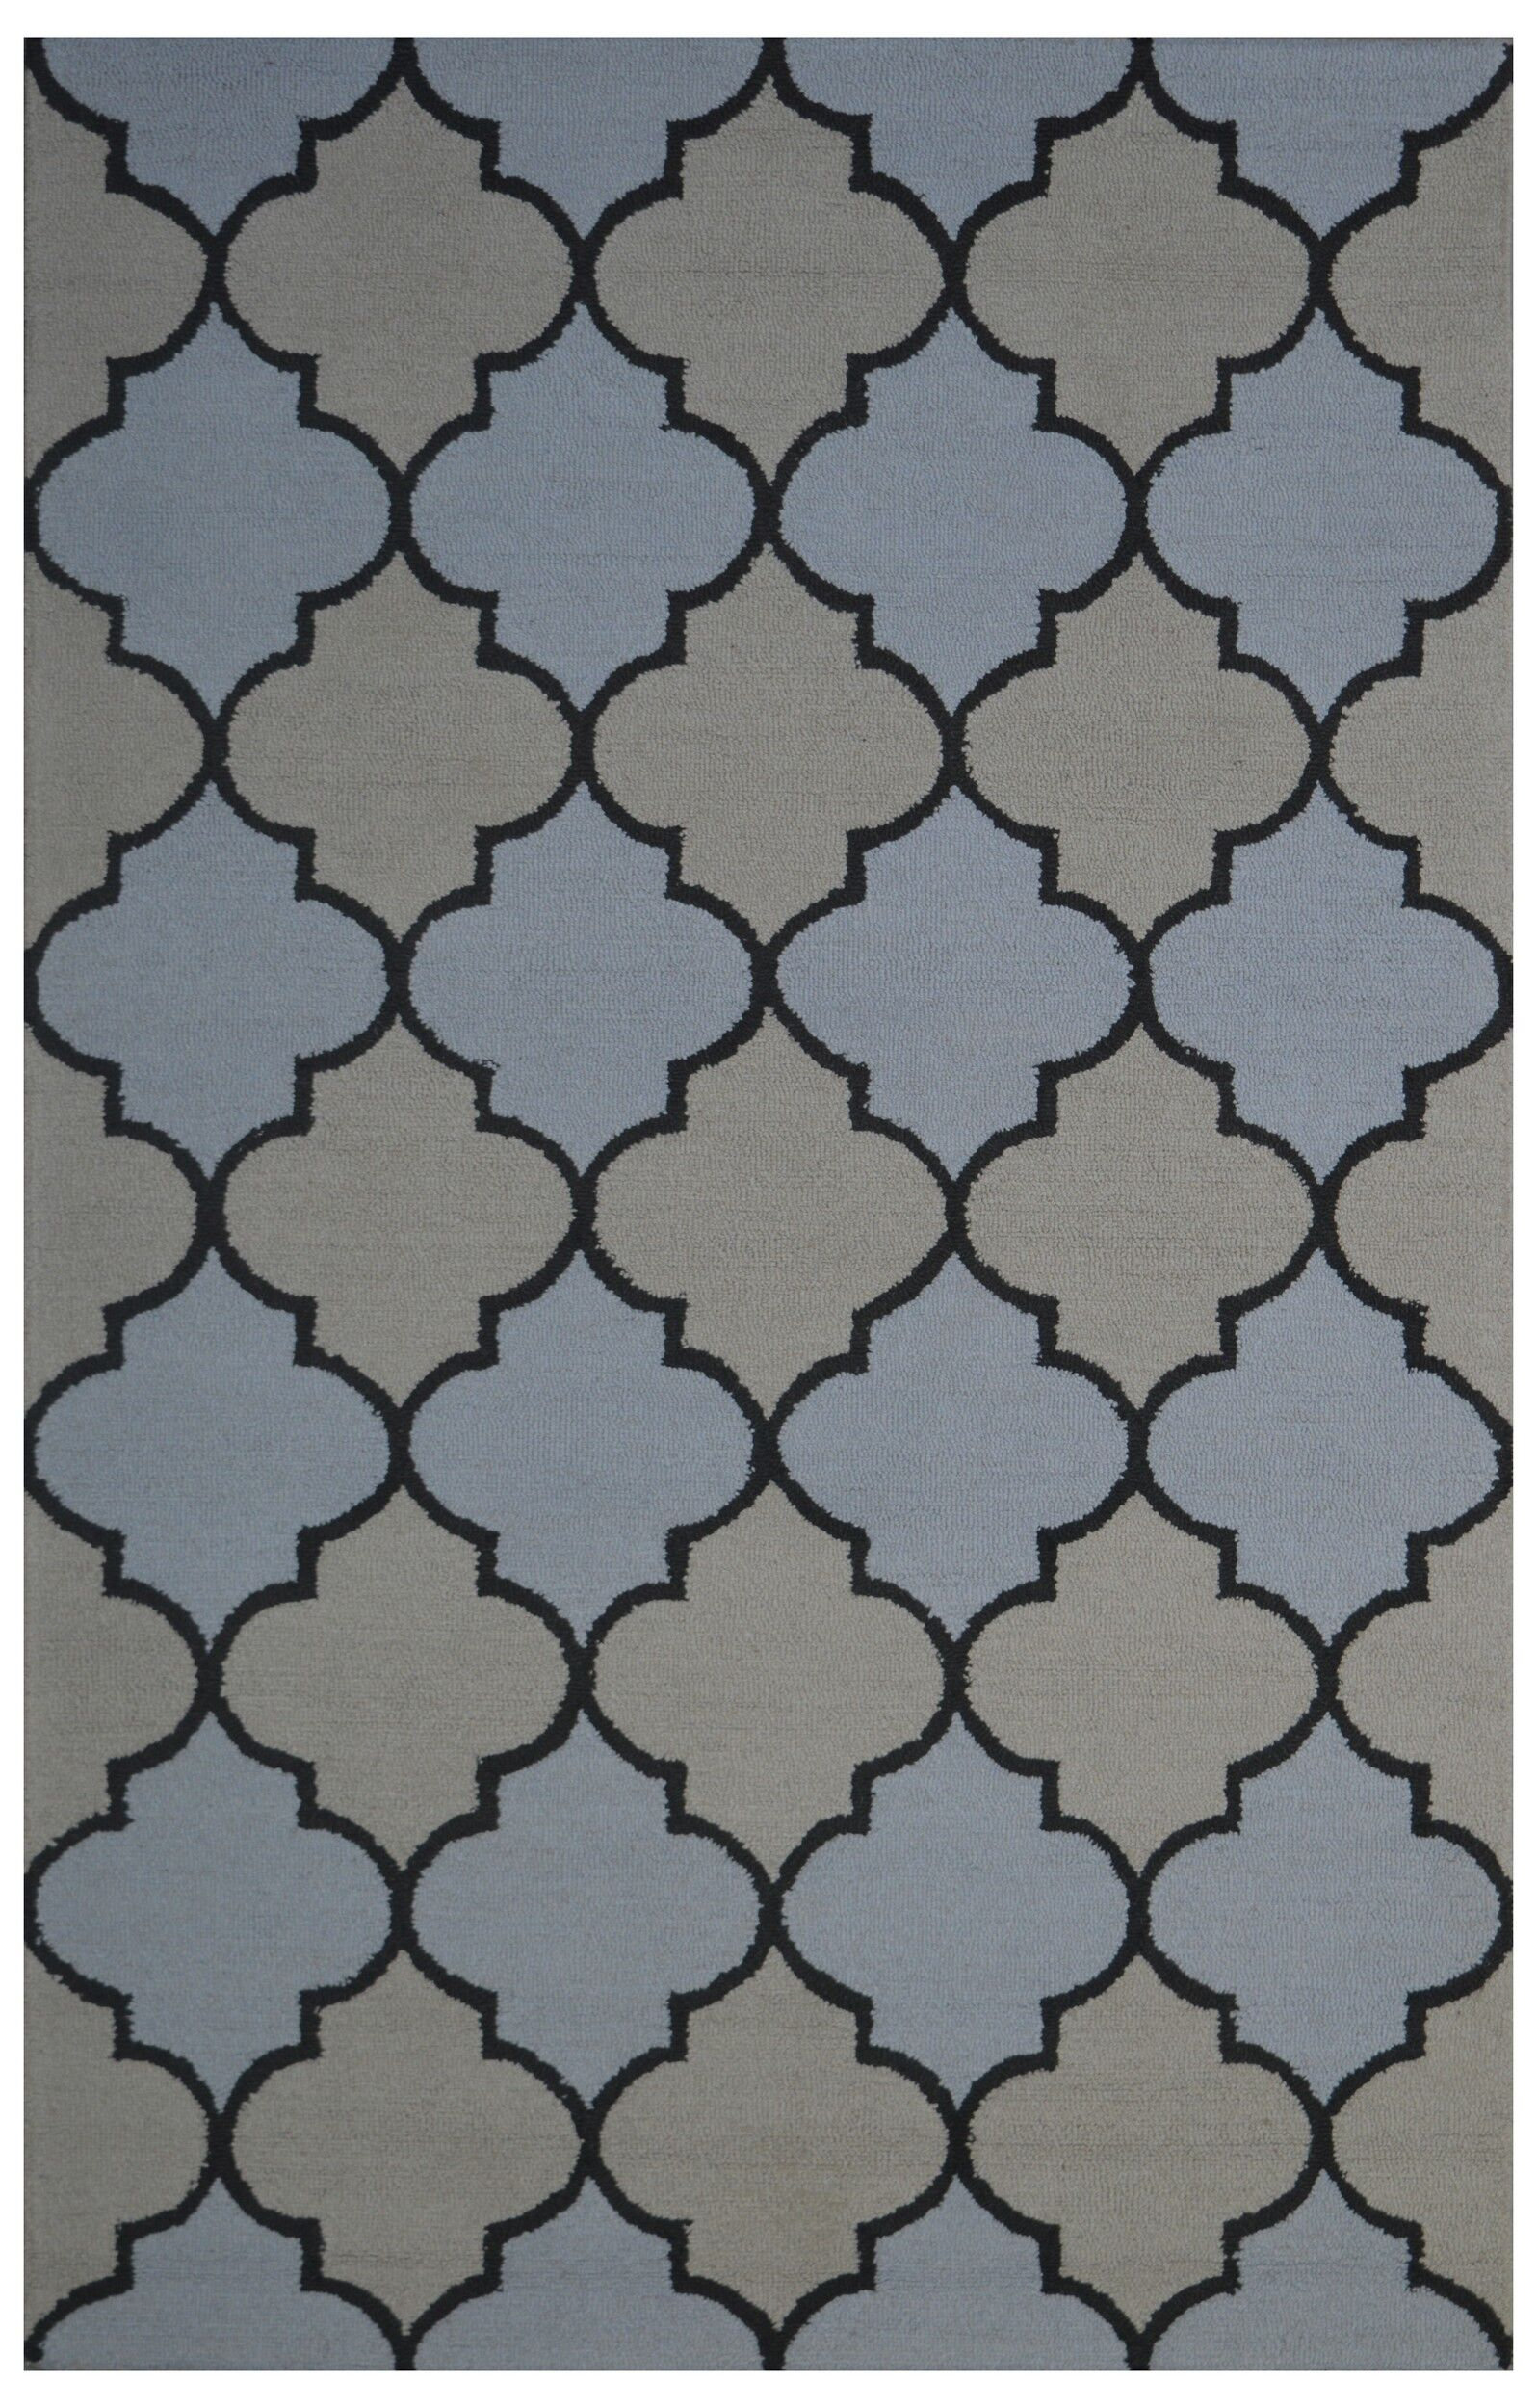 Wool Hand-Tufted Beige/Light Blue Area Rug Rug Size: 5' x 8'